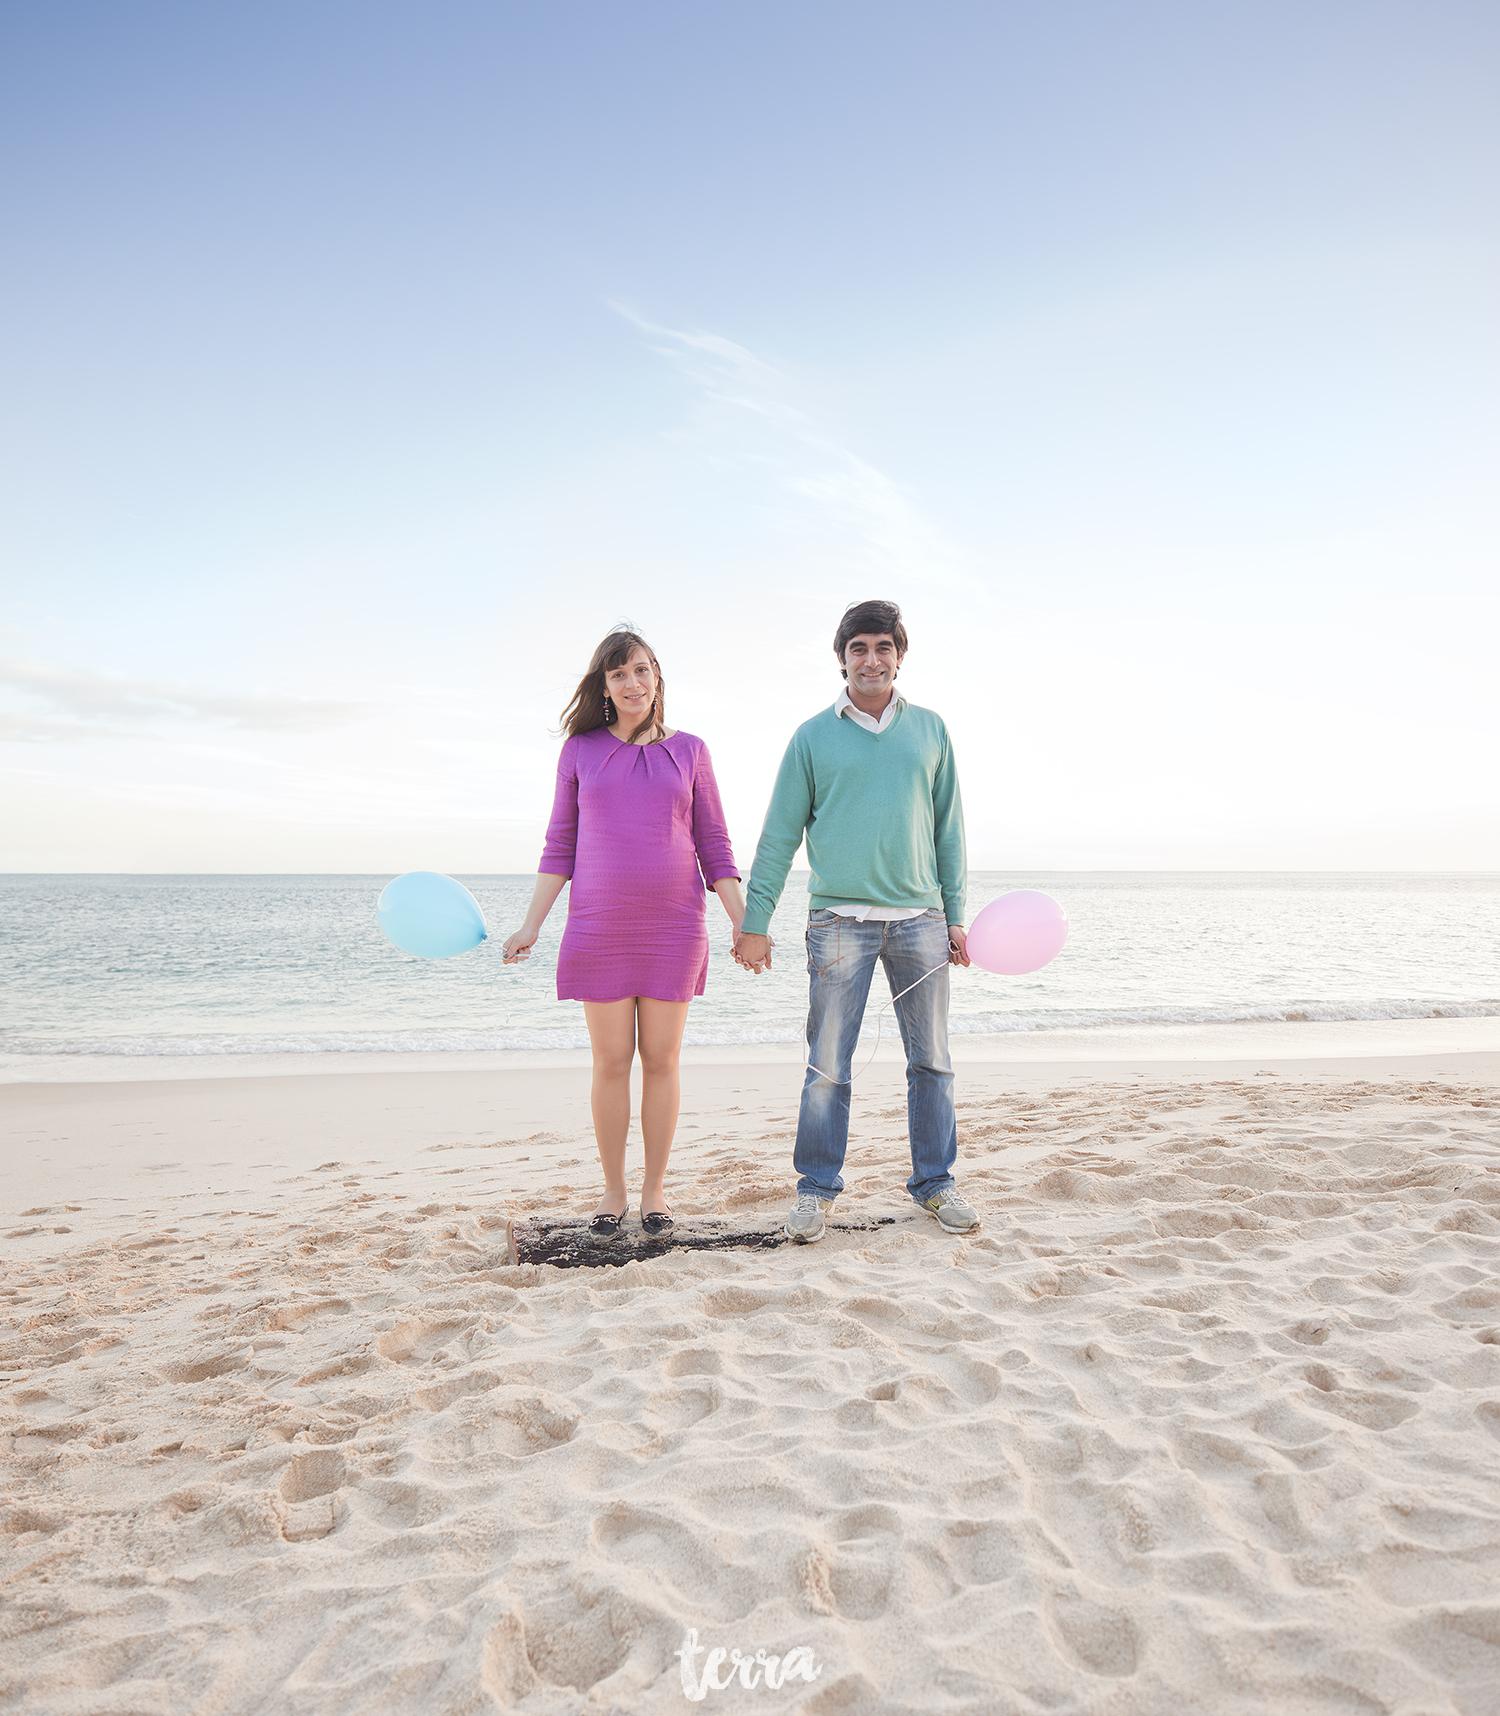 sessao-fotografica-gravidez-praia-portinho-arrabida-terra-fotografia-0020.jpg